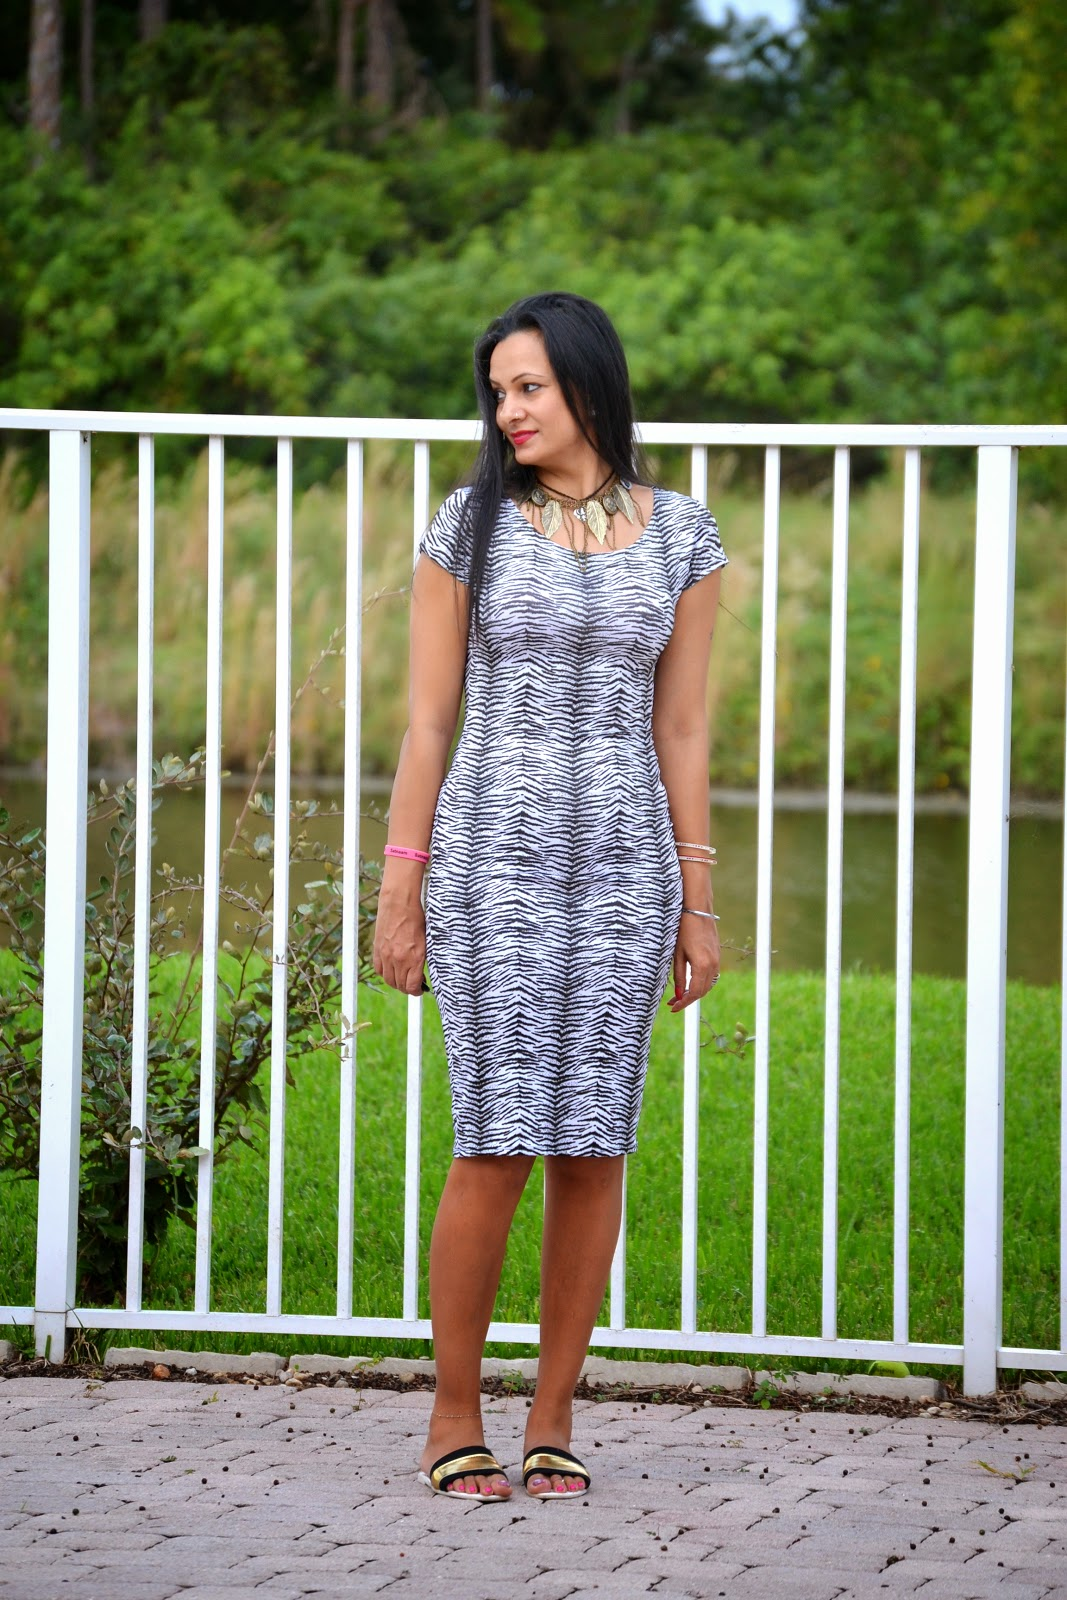 dresses party dresses bodycon zebra print dress shoes online cheap shoes www.sandysandhu.co